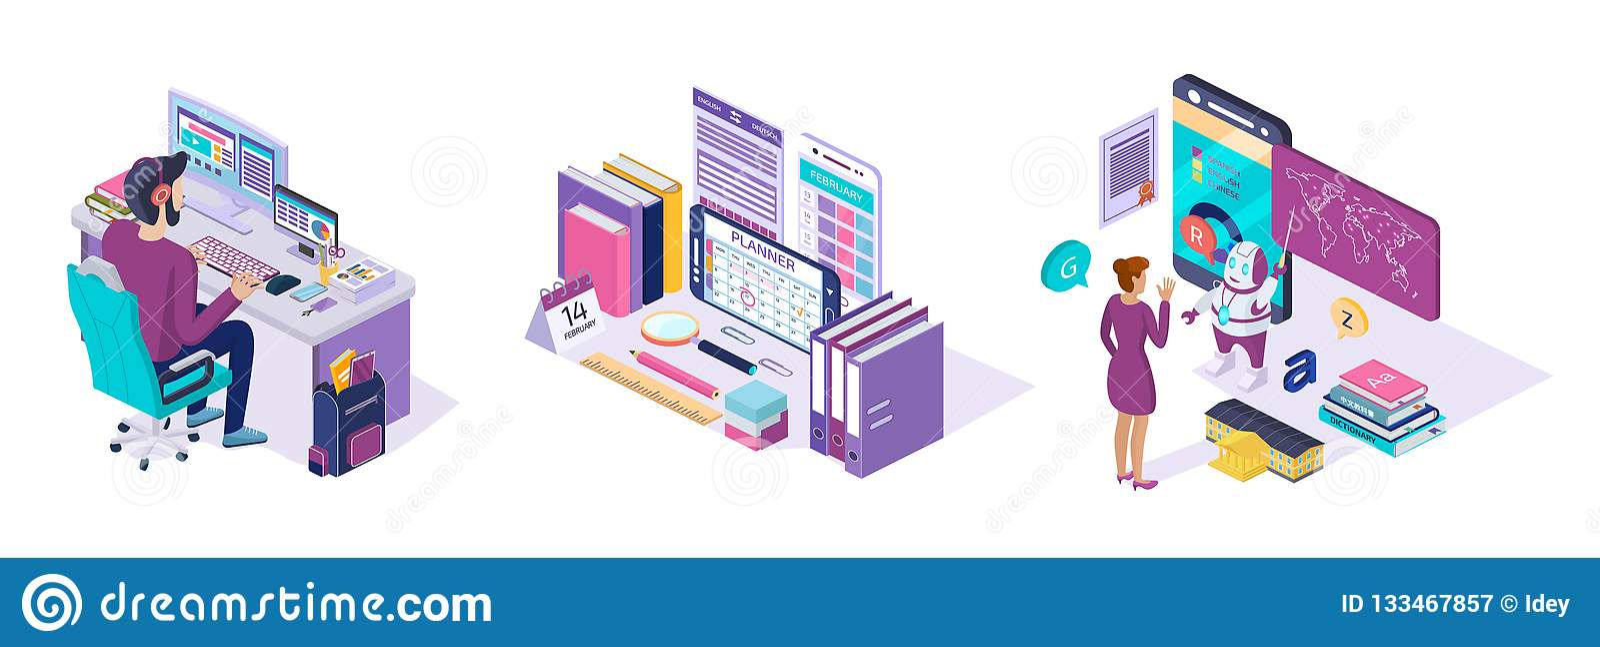 Online Training  E-learning Course School Language, Education Via